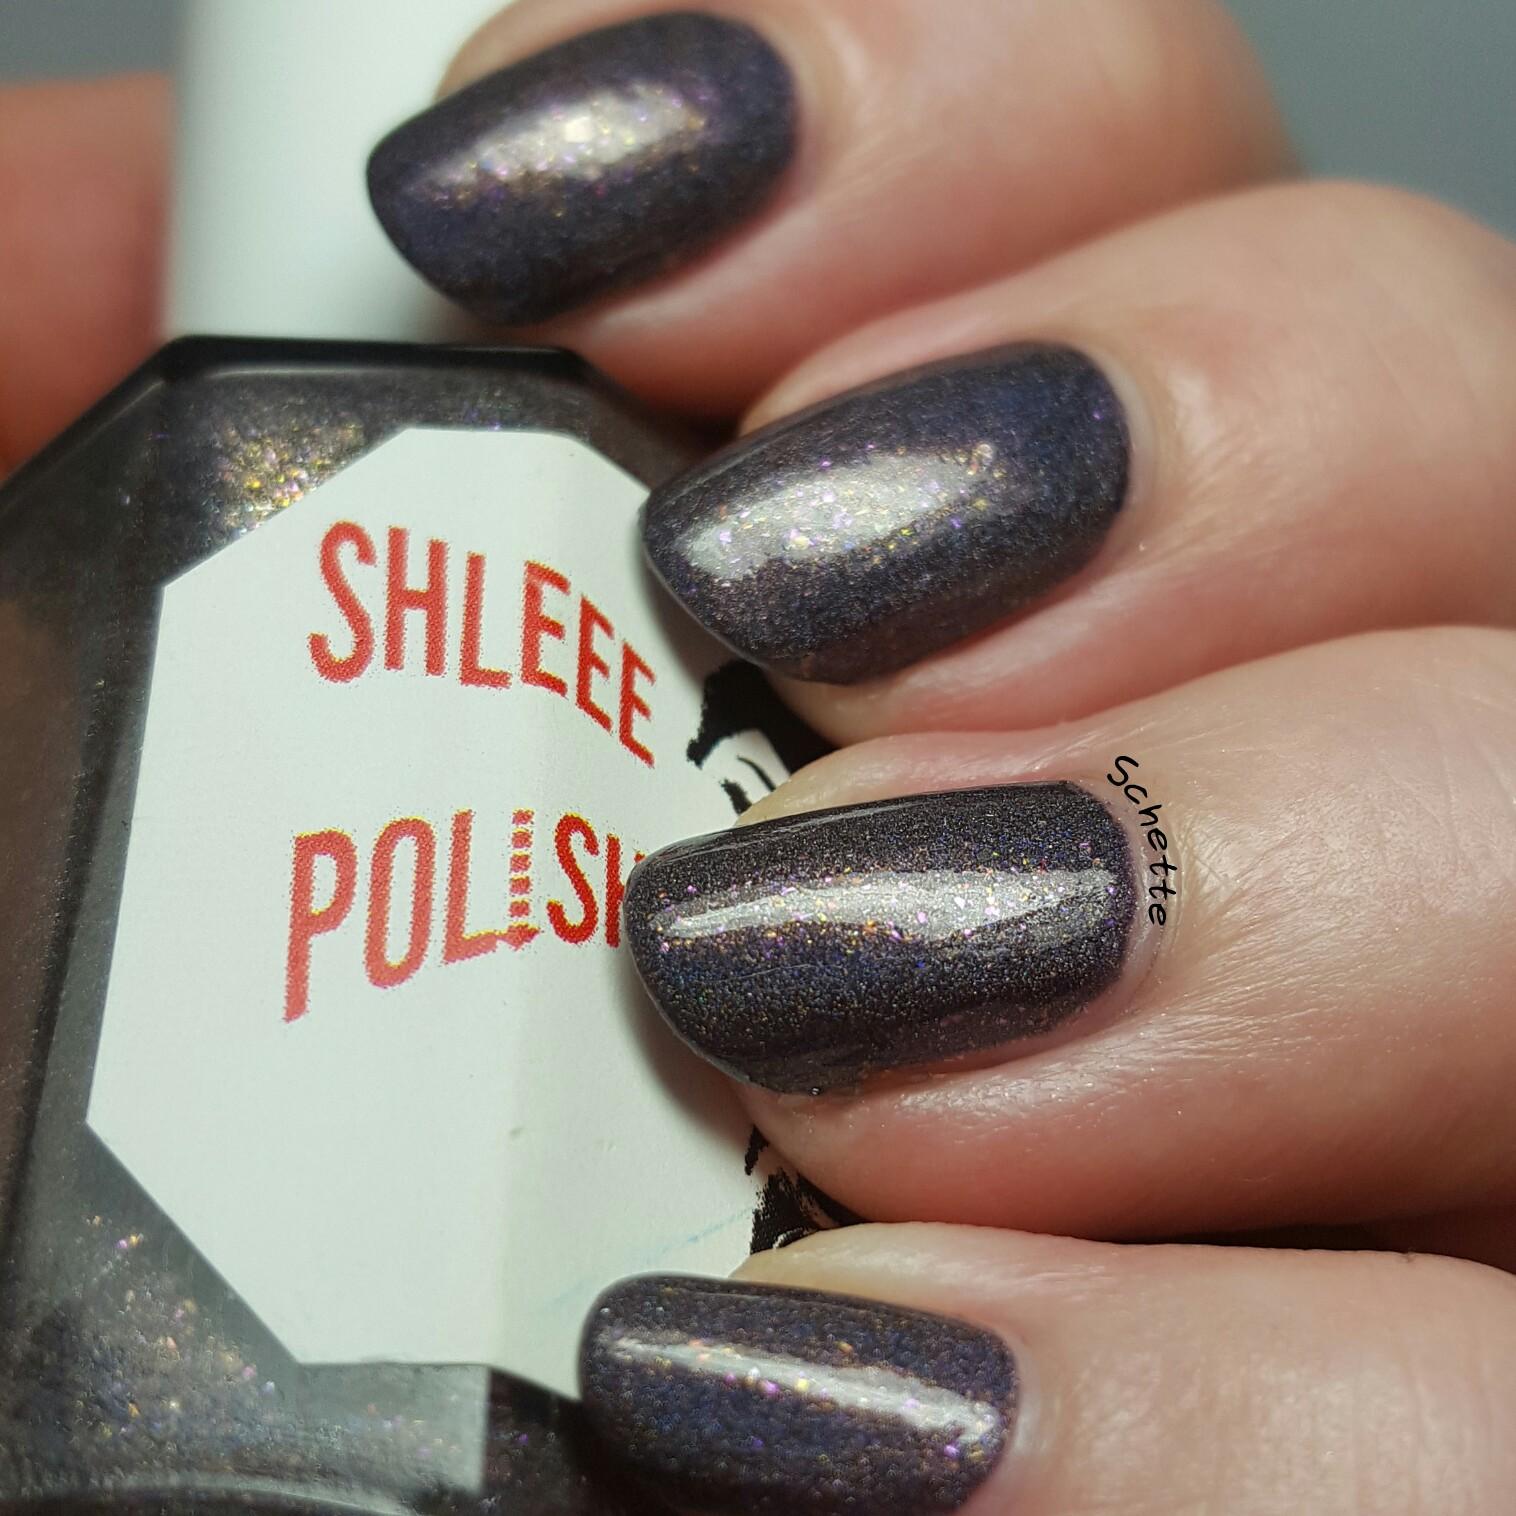 Shleee Polish - Marceline